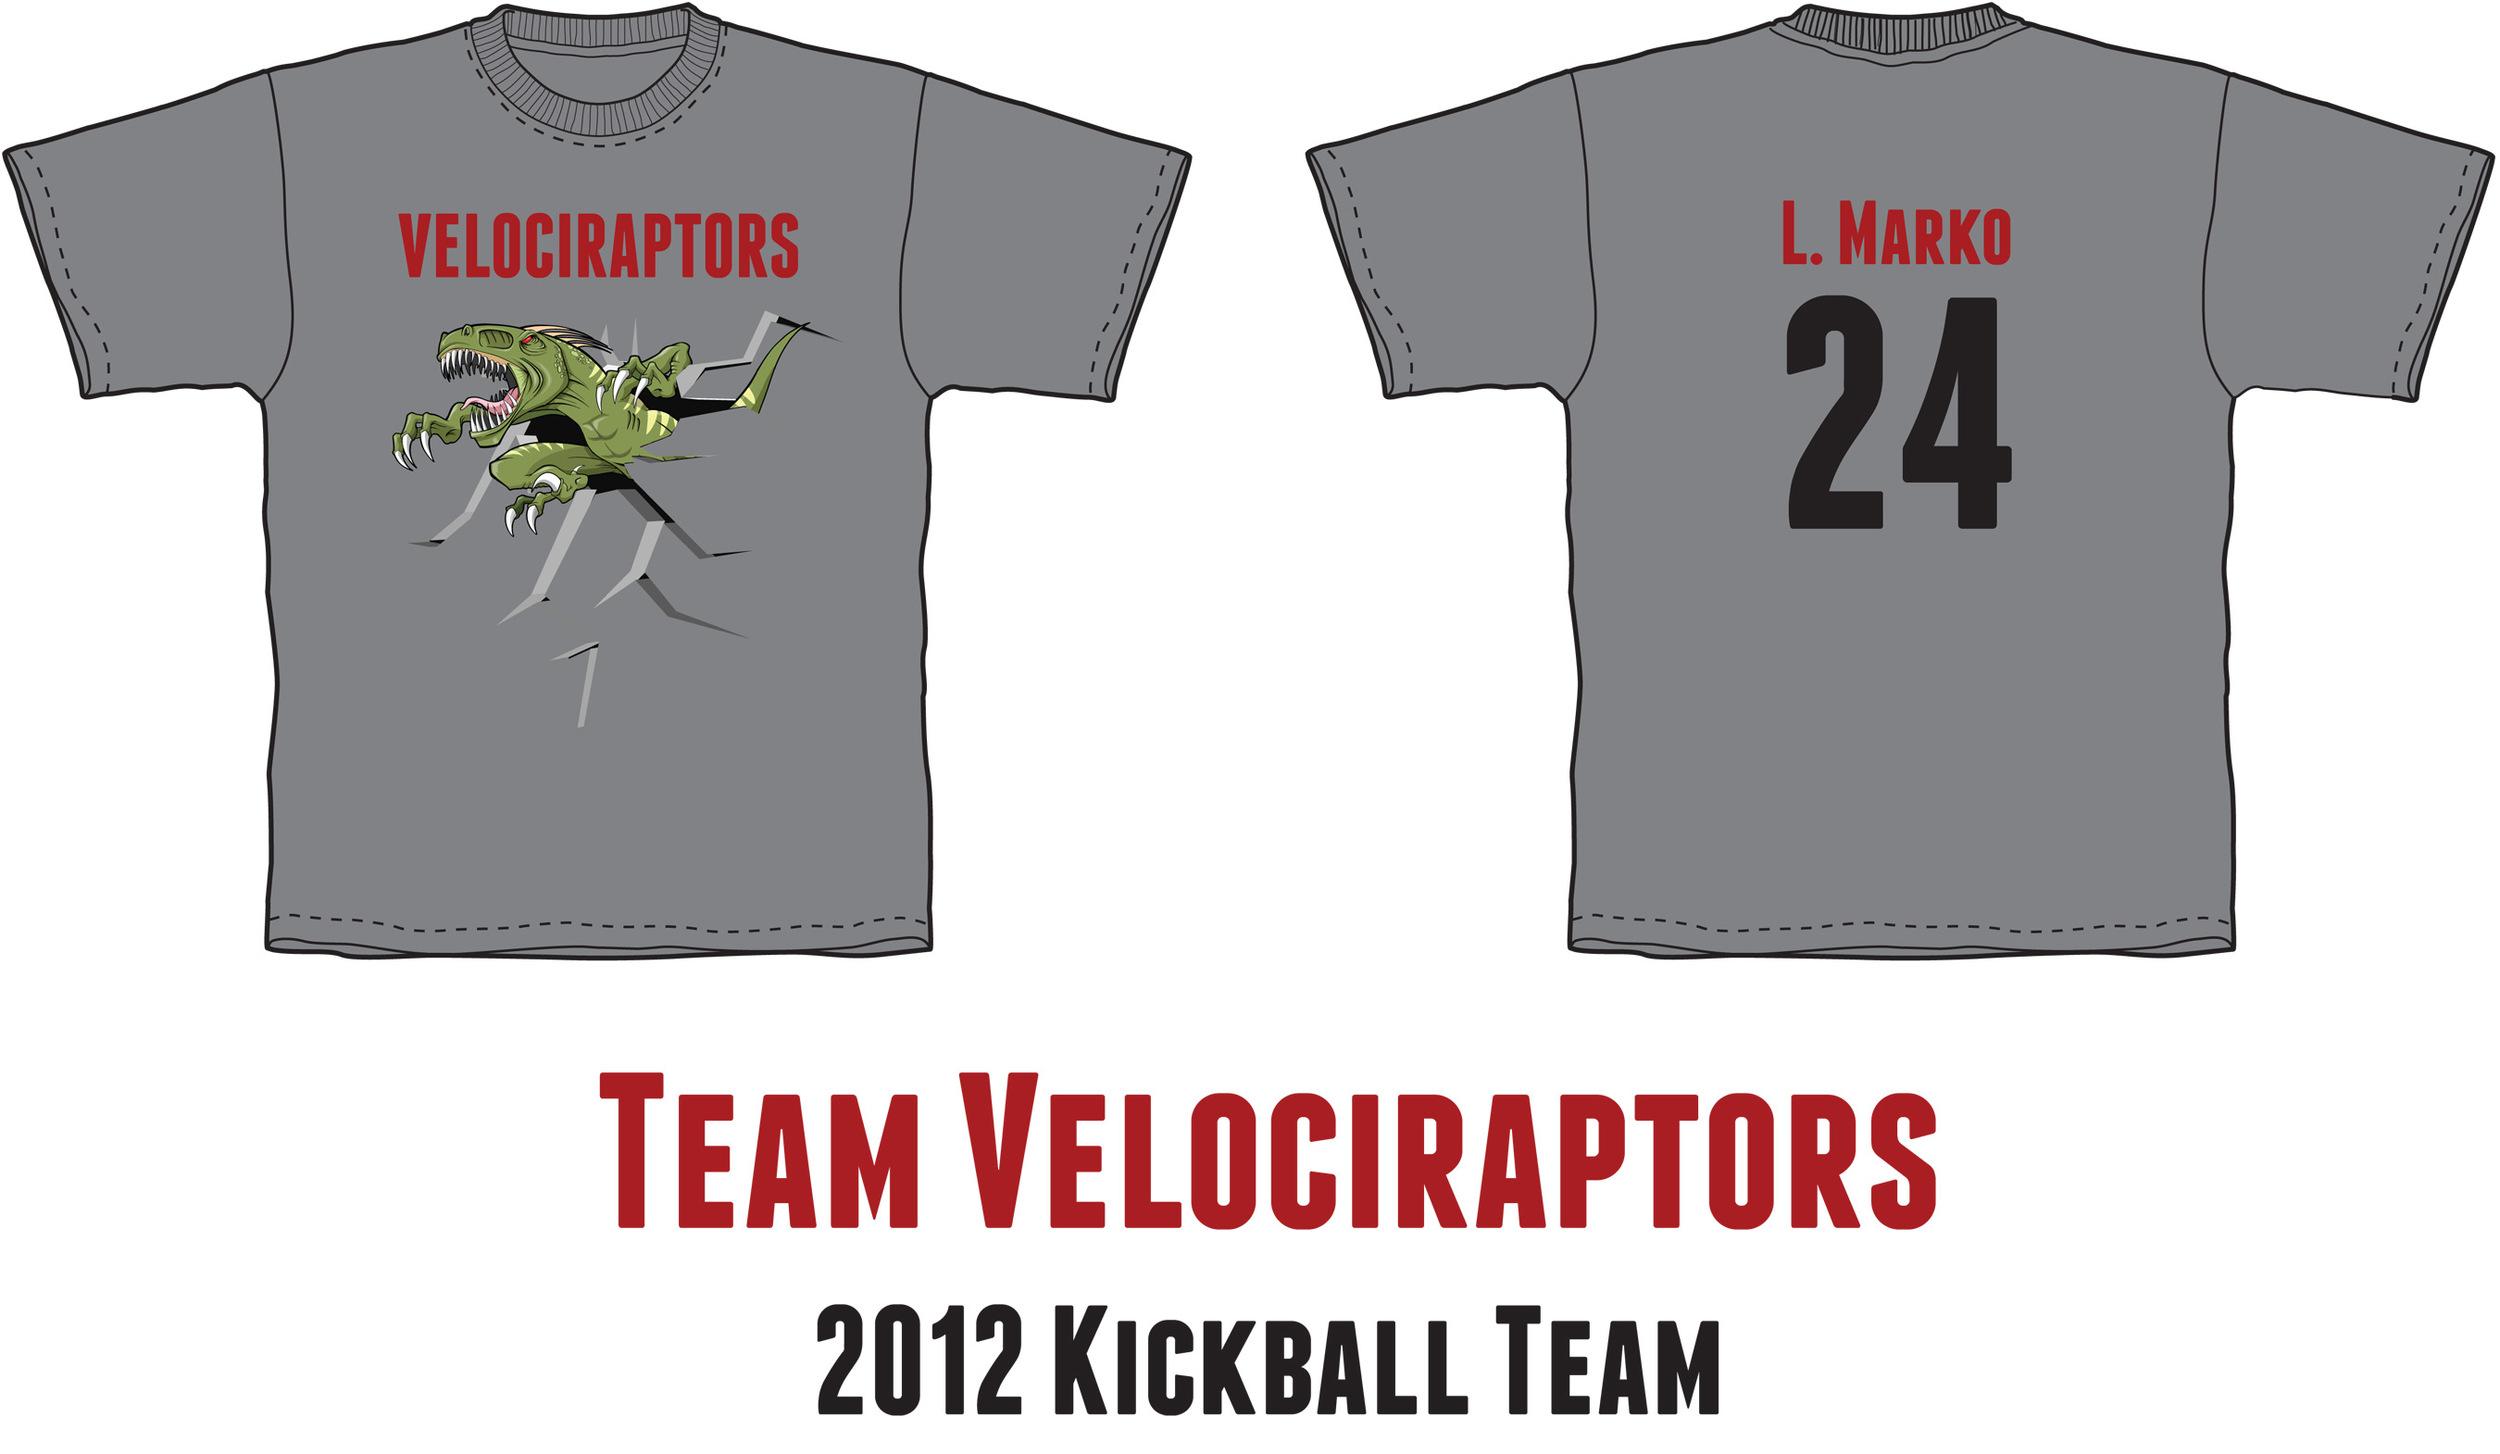 Velociraptor-Team-shirts.jpg